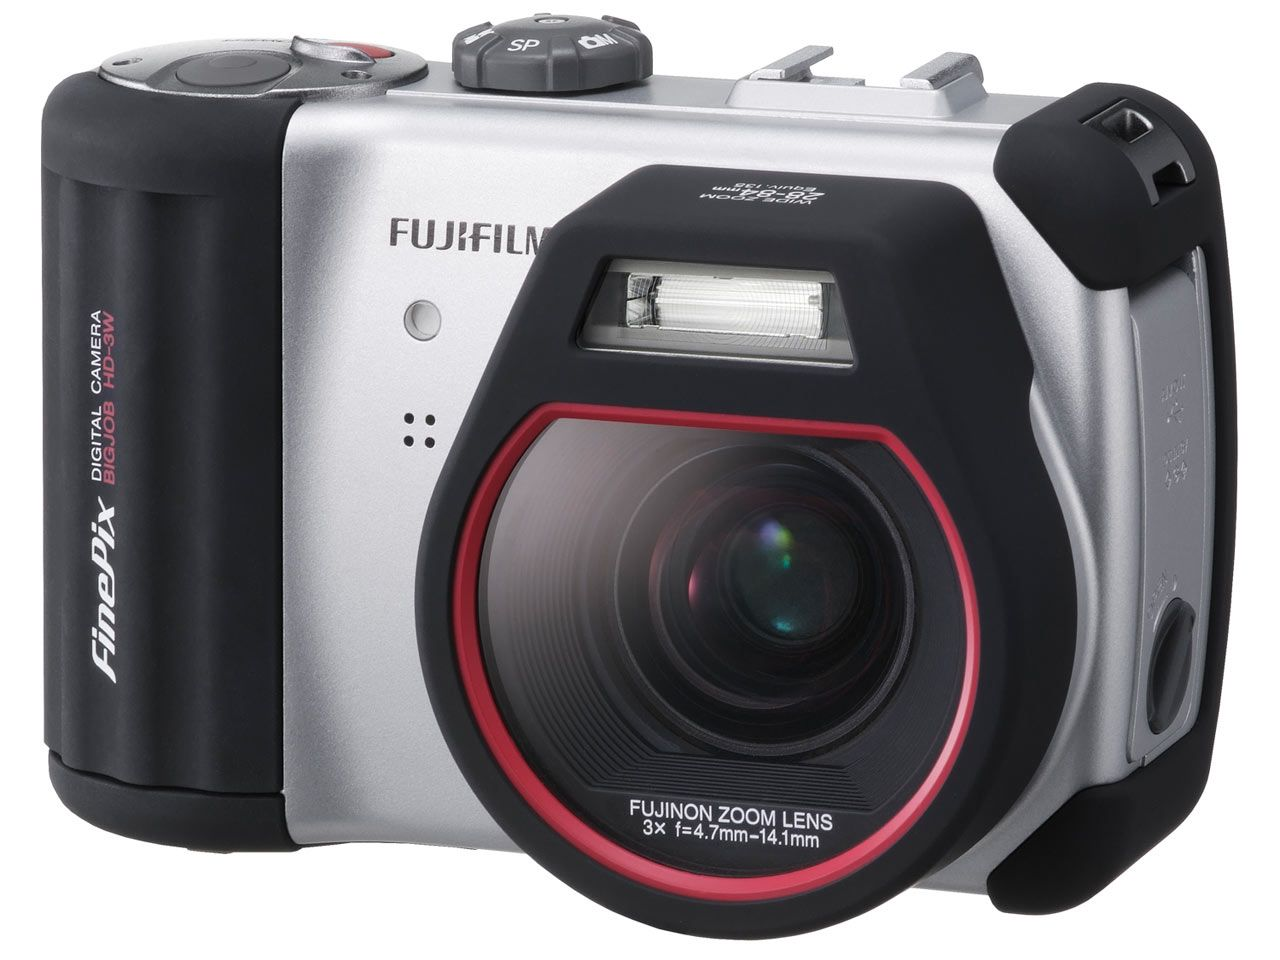 Digitalkamera i romdrakt